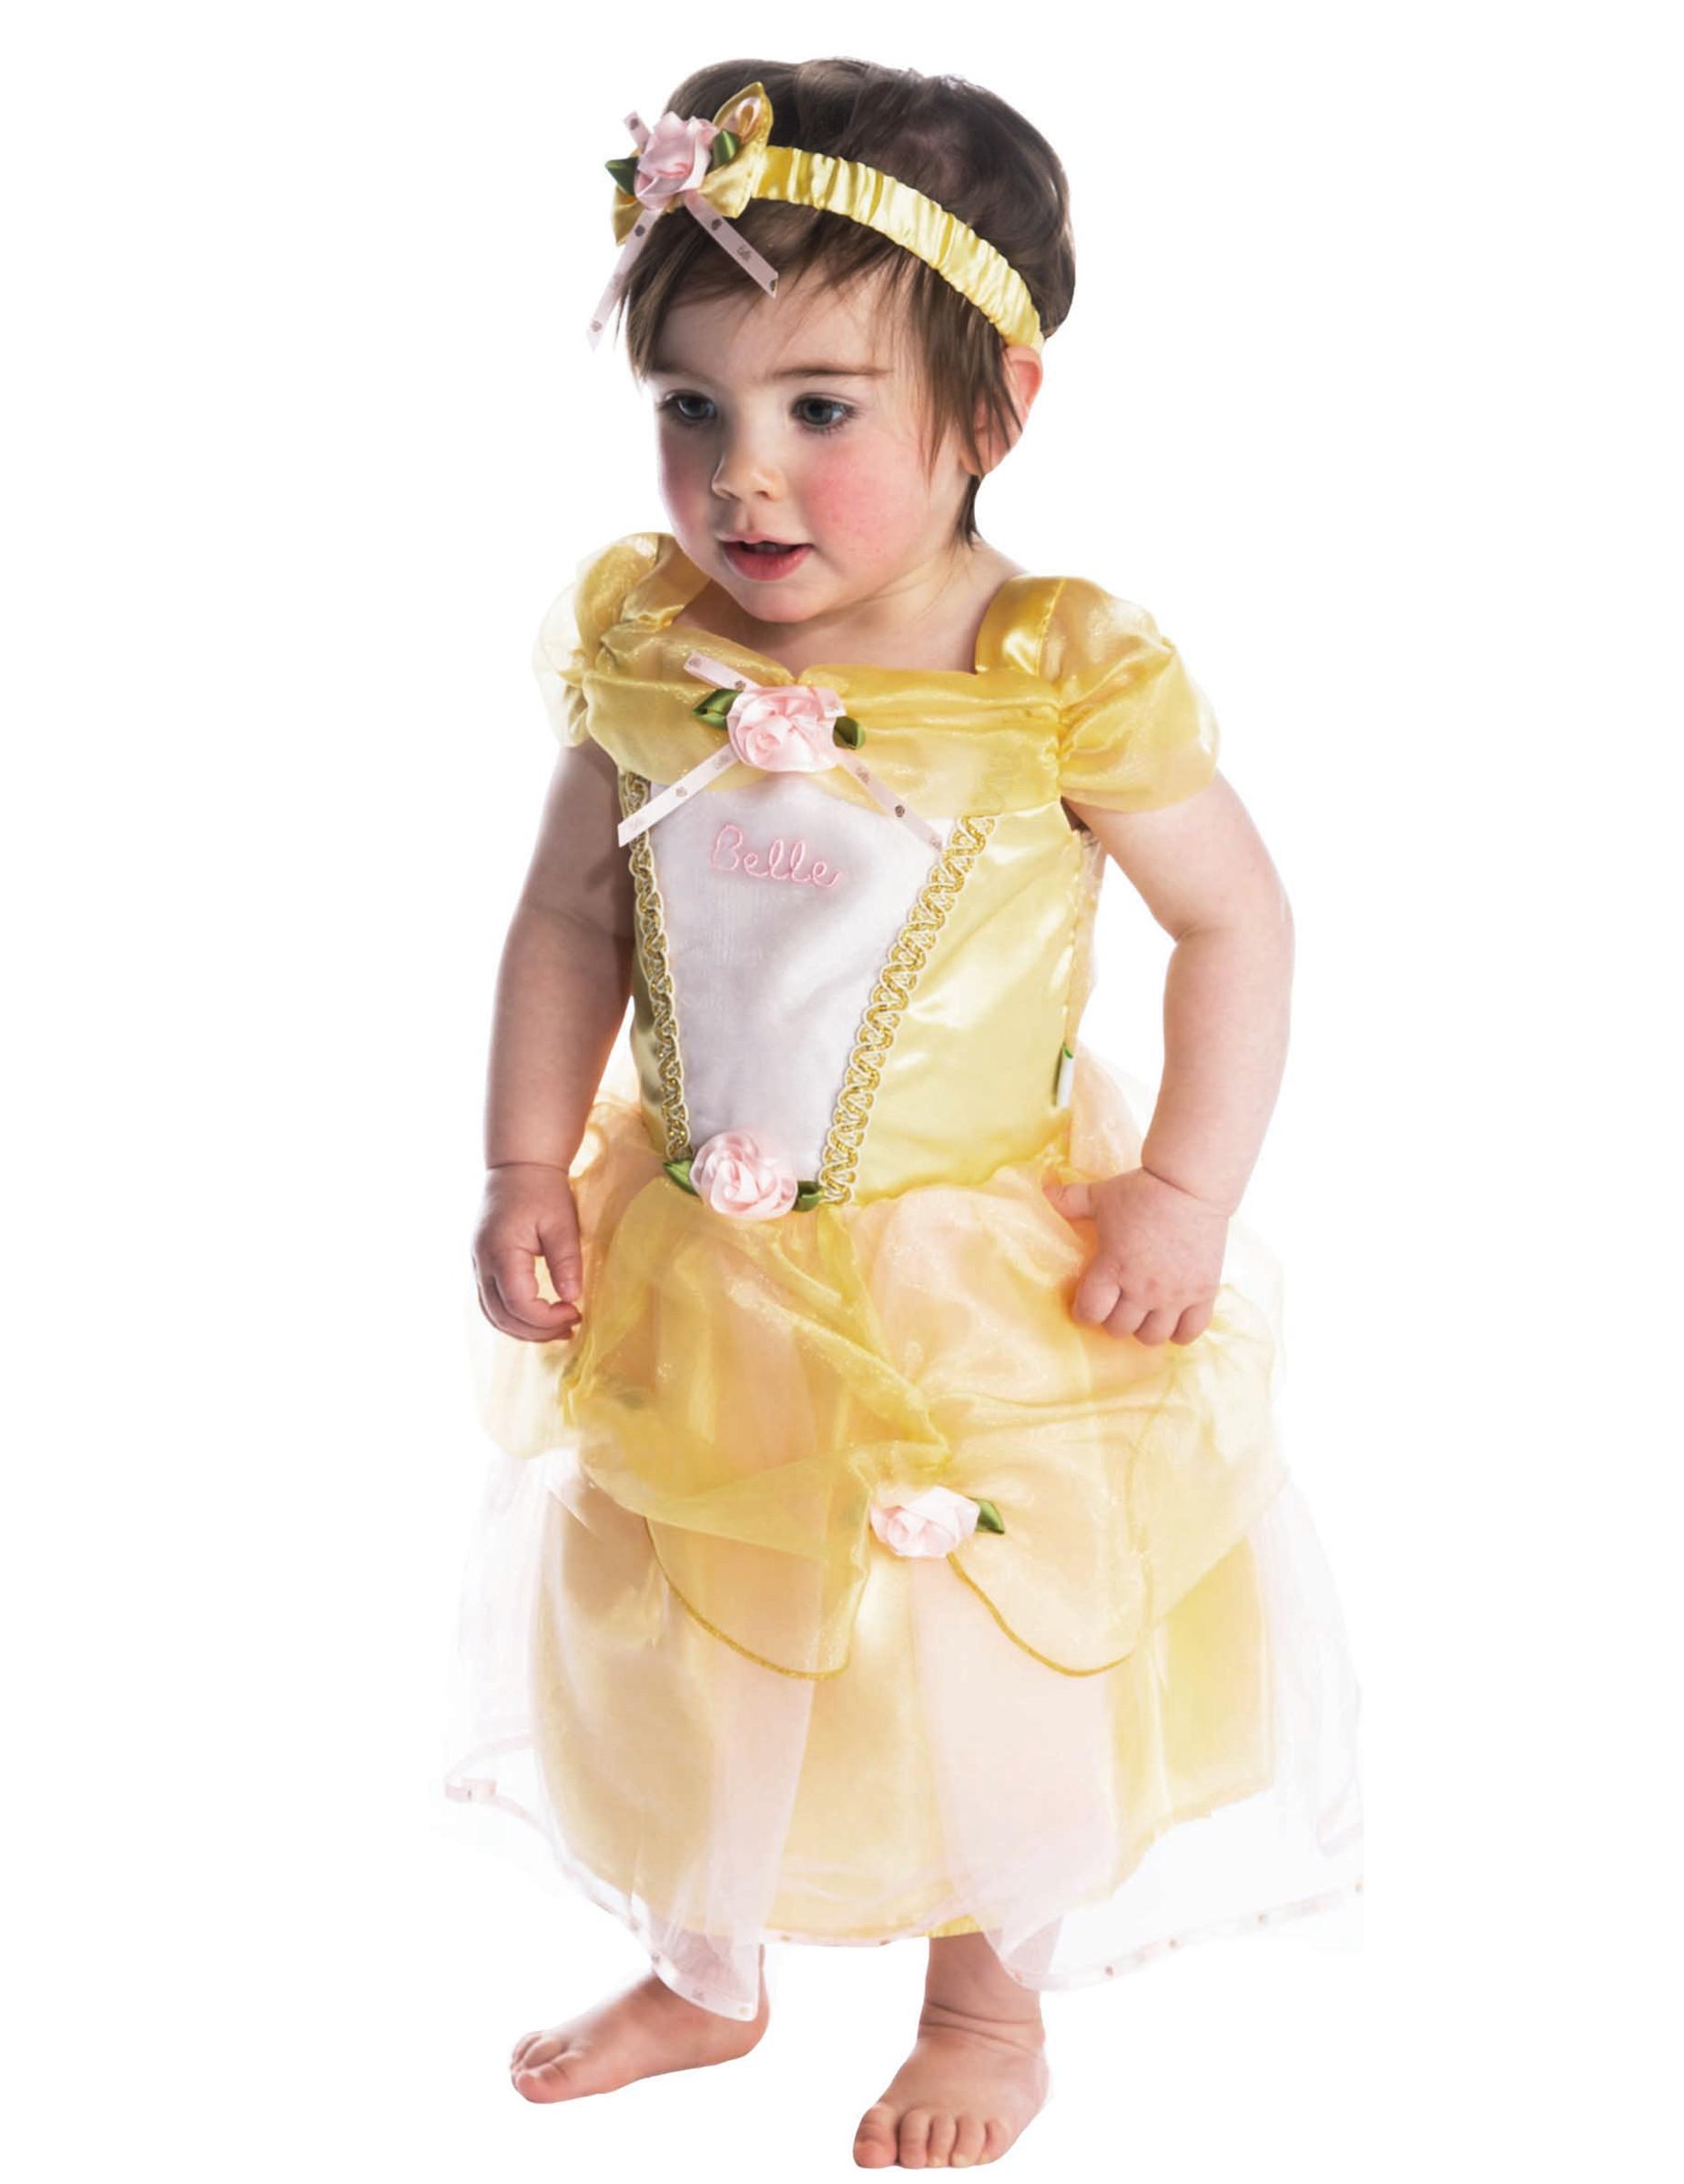 disney belle prinzessin babykost m lizenzware gelb g nstige faschings kost me bei karneval. Black Bedroom Furniture Sets. Home Design Ideas